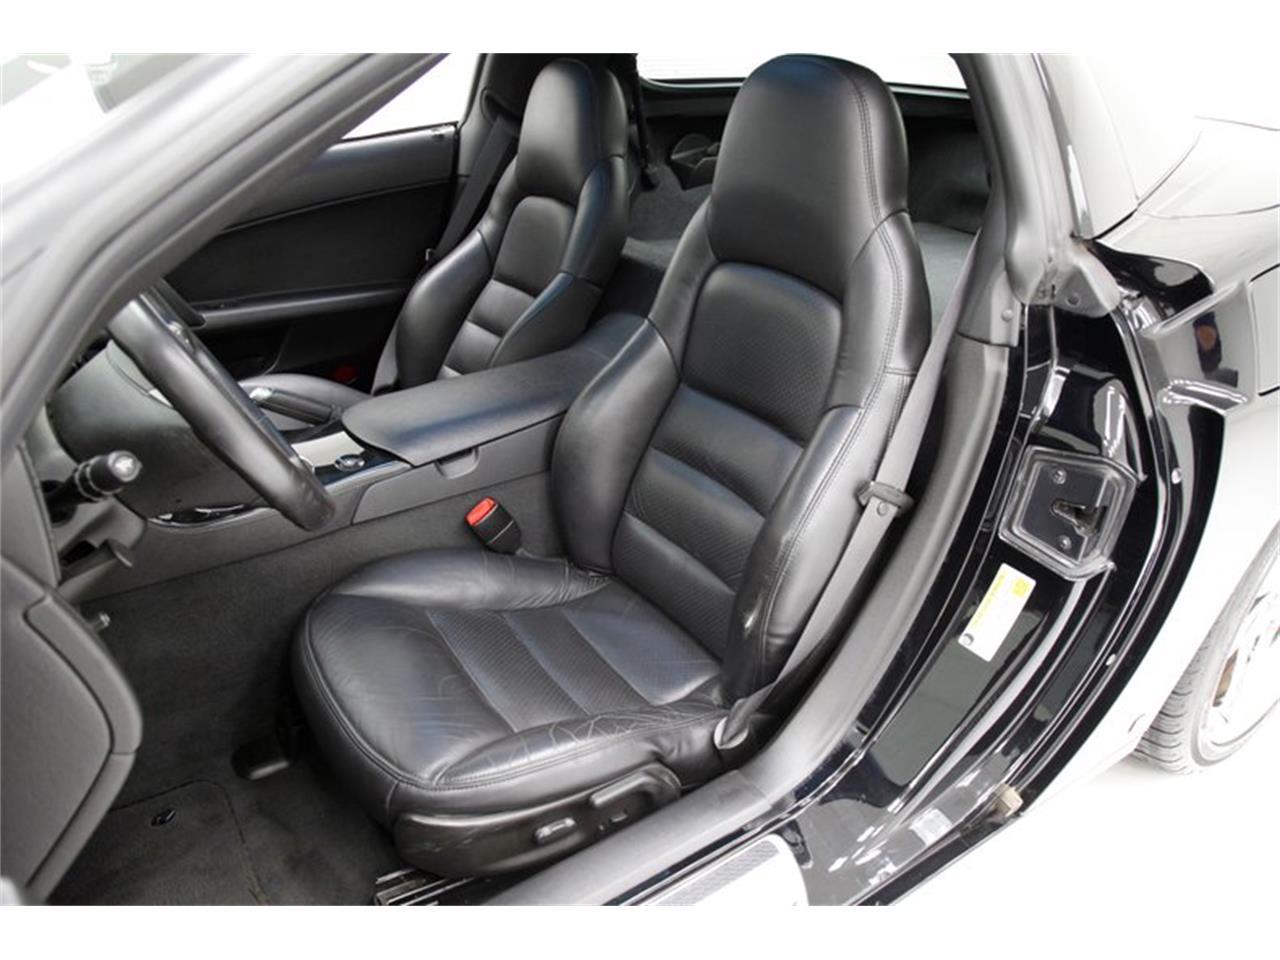 2008 Chevrolet Corvette (CC-1423574) for sale in Morgantown, Pennsylvania